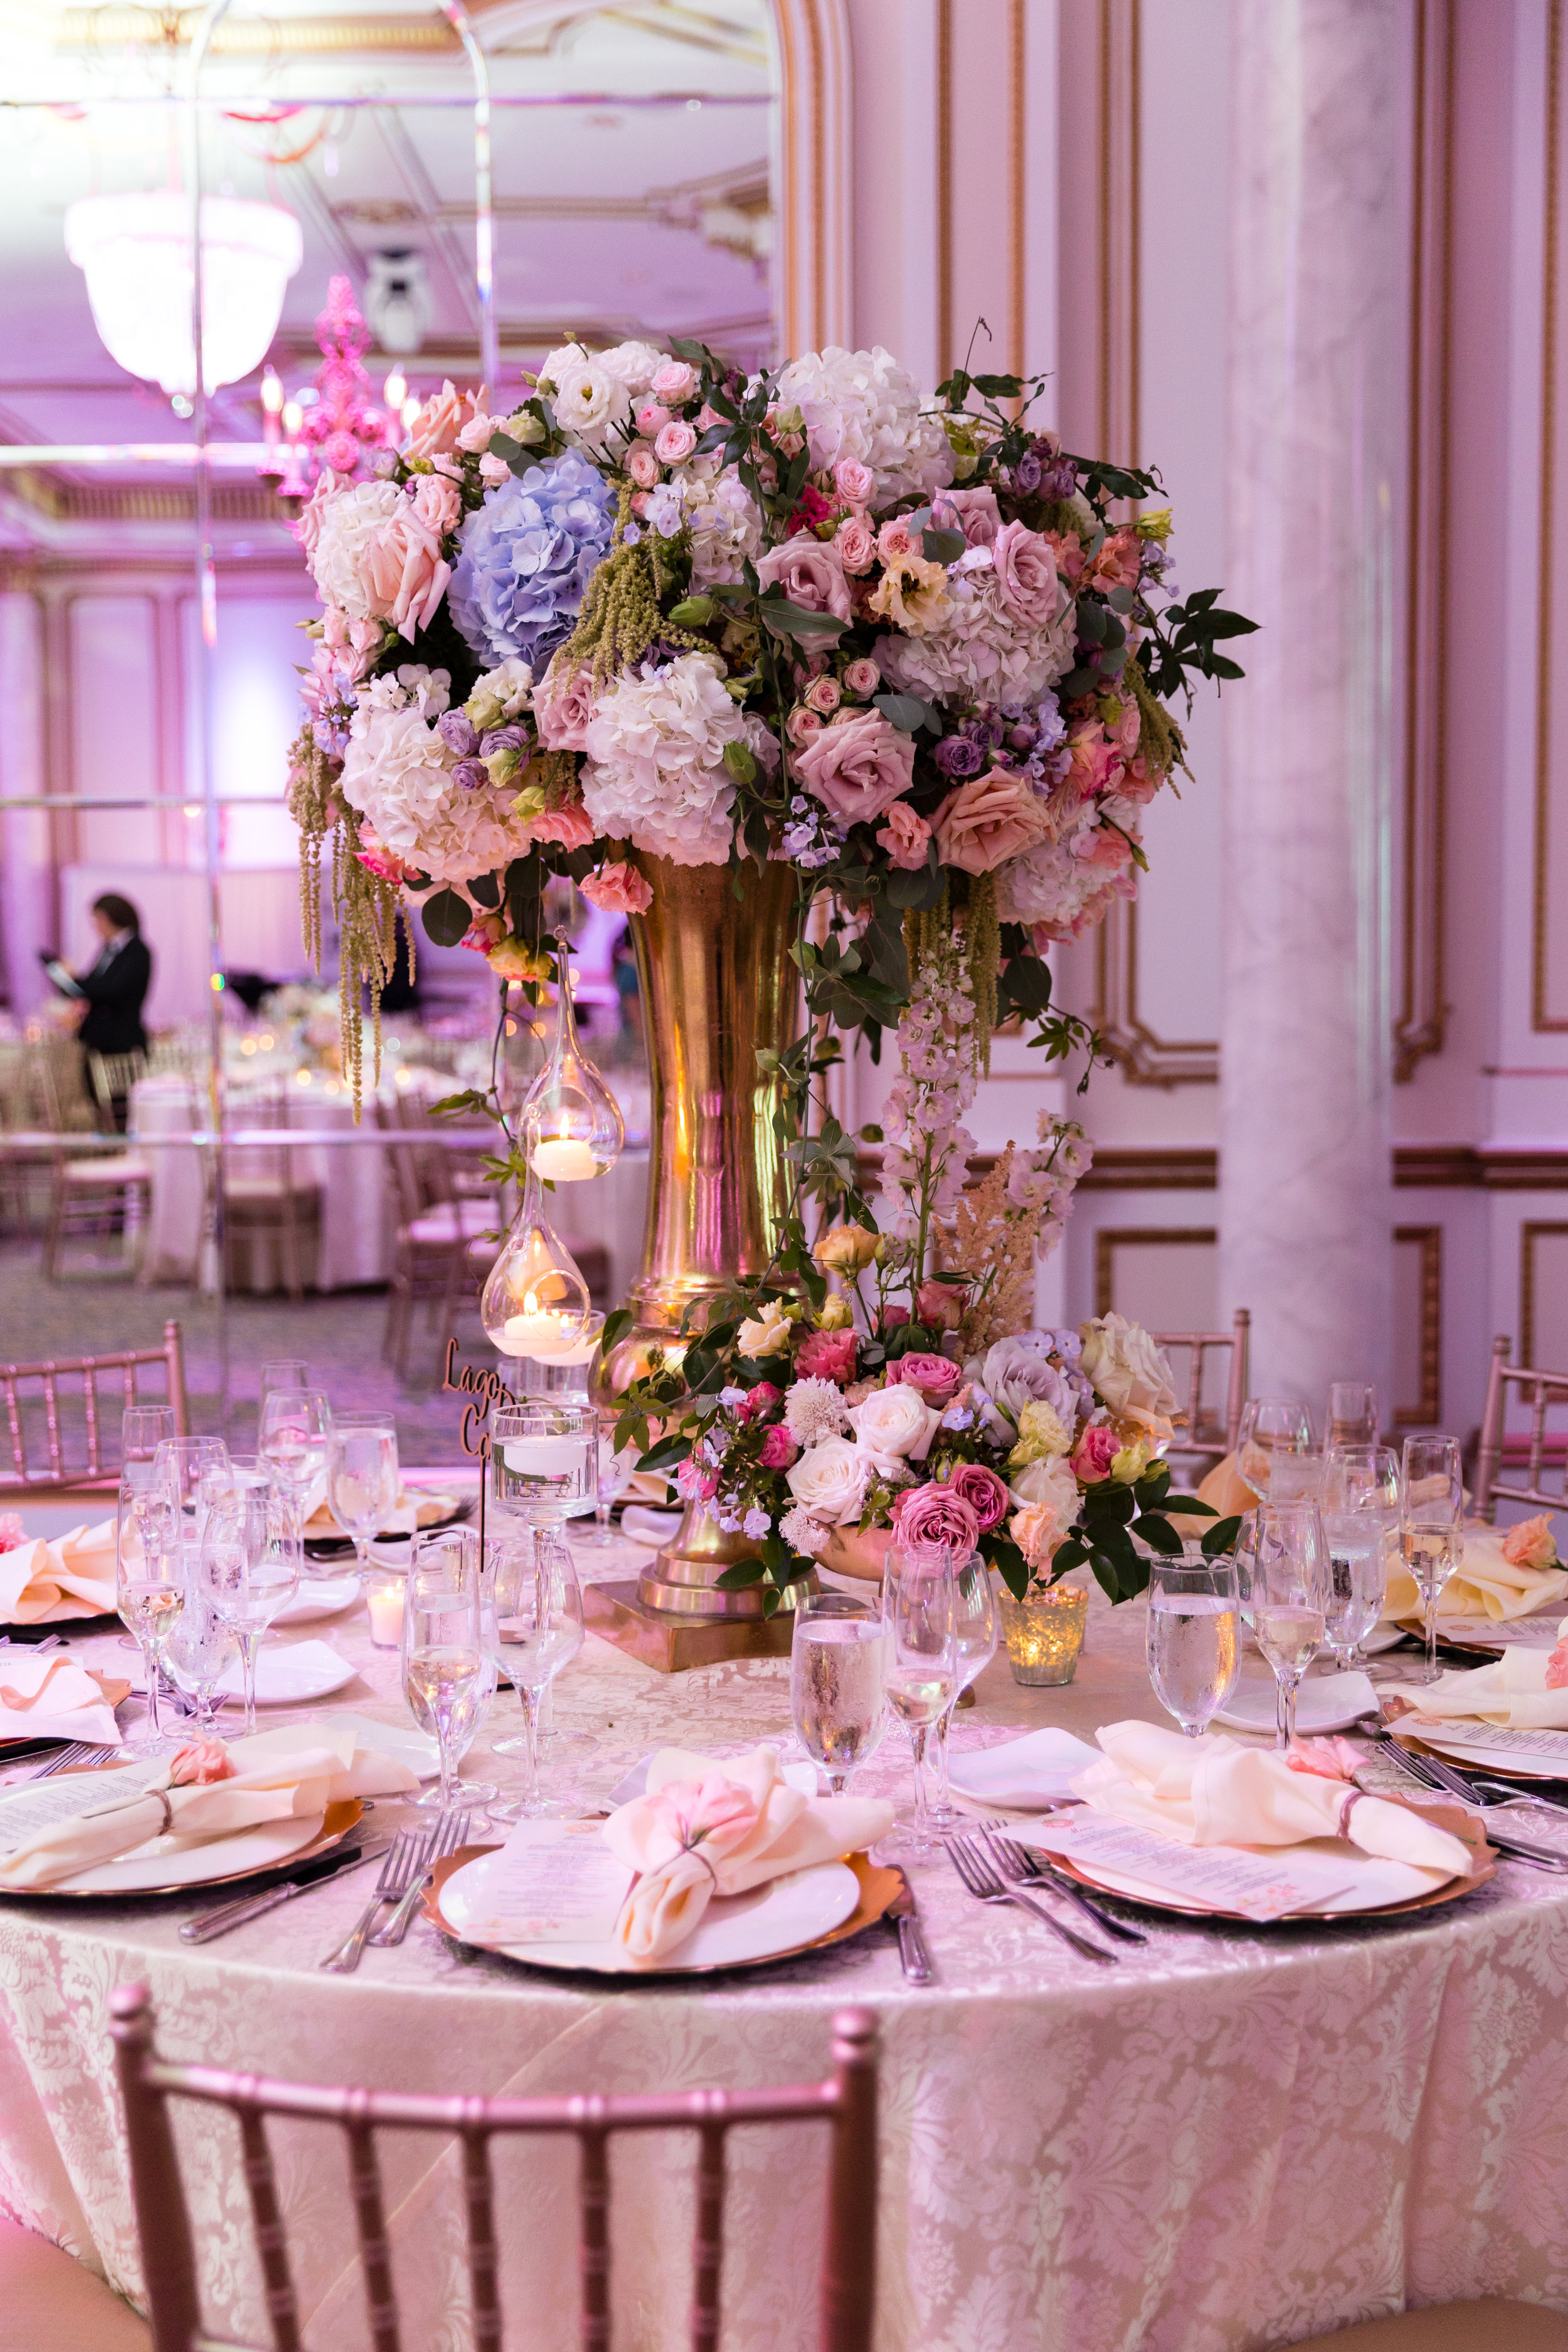 INDIAN WEDDING RECEPTION TABLE DECOR 2.jpg